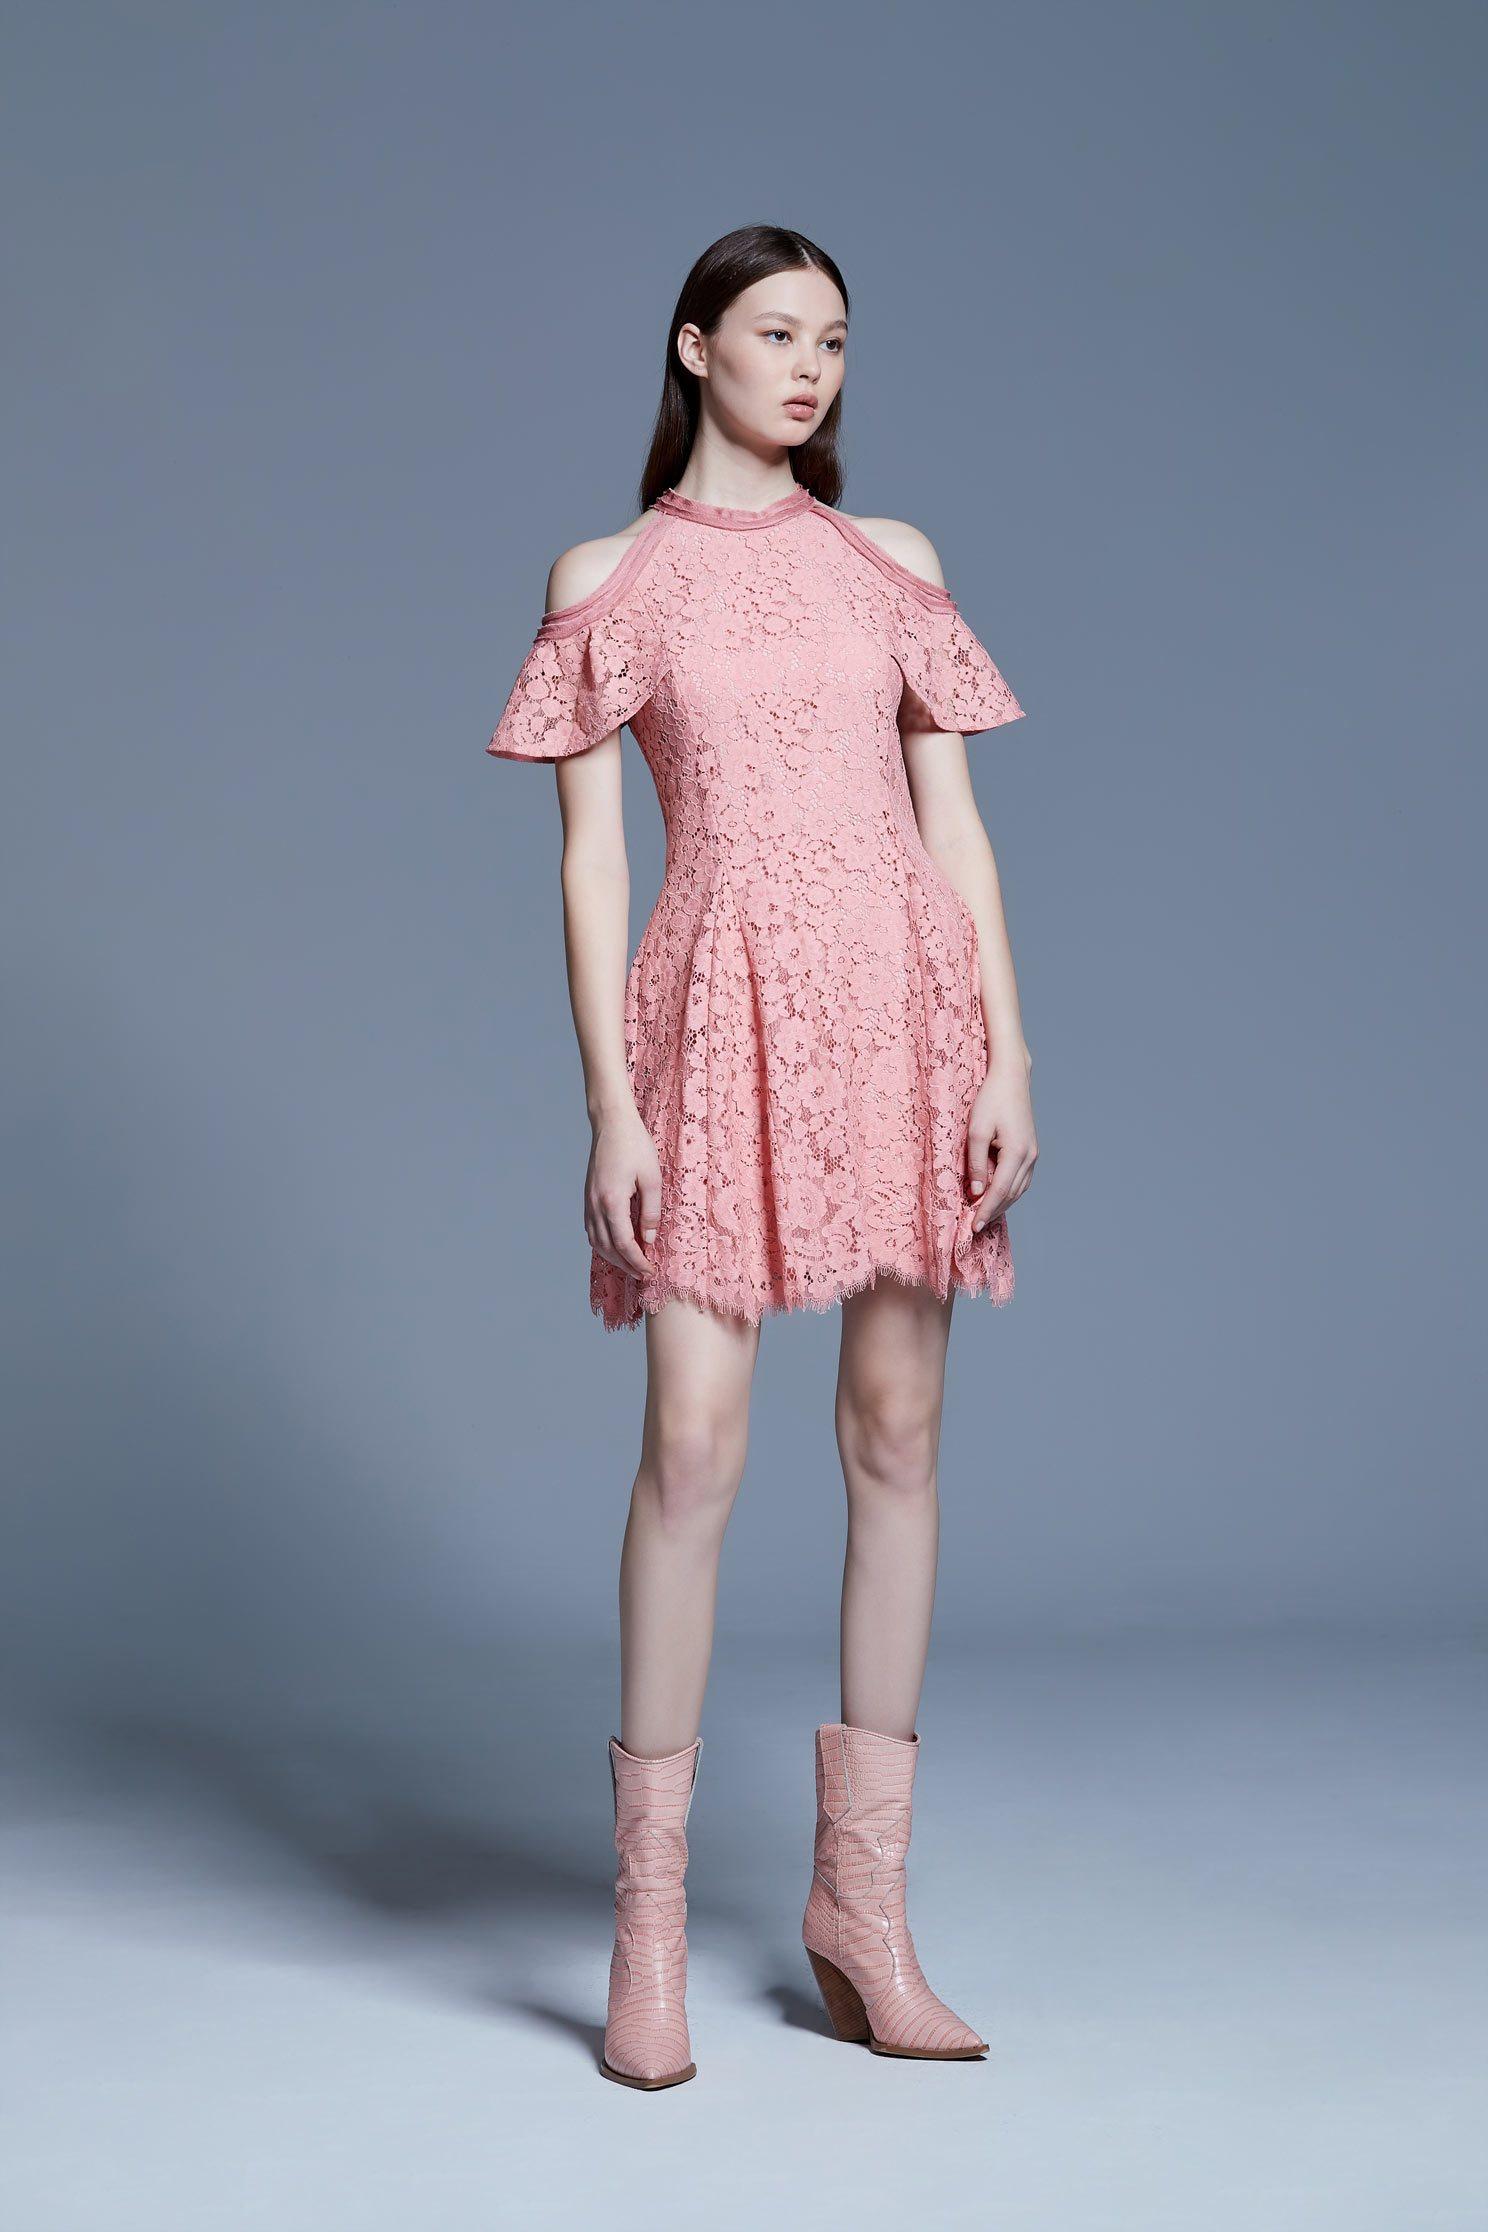 Pink lace off-shoulder short dress,V-neck dress,Cocktail Dress,Evening Wear,Lace,Lace Dress,透膚洋裝